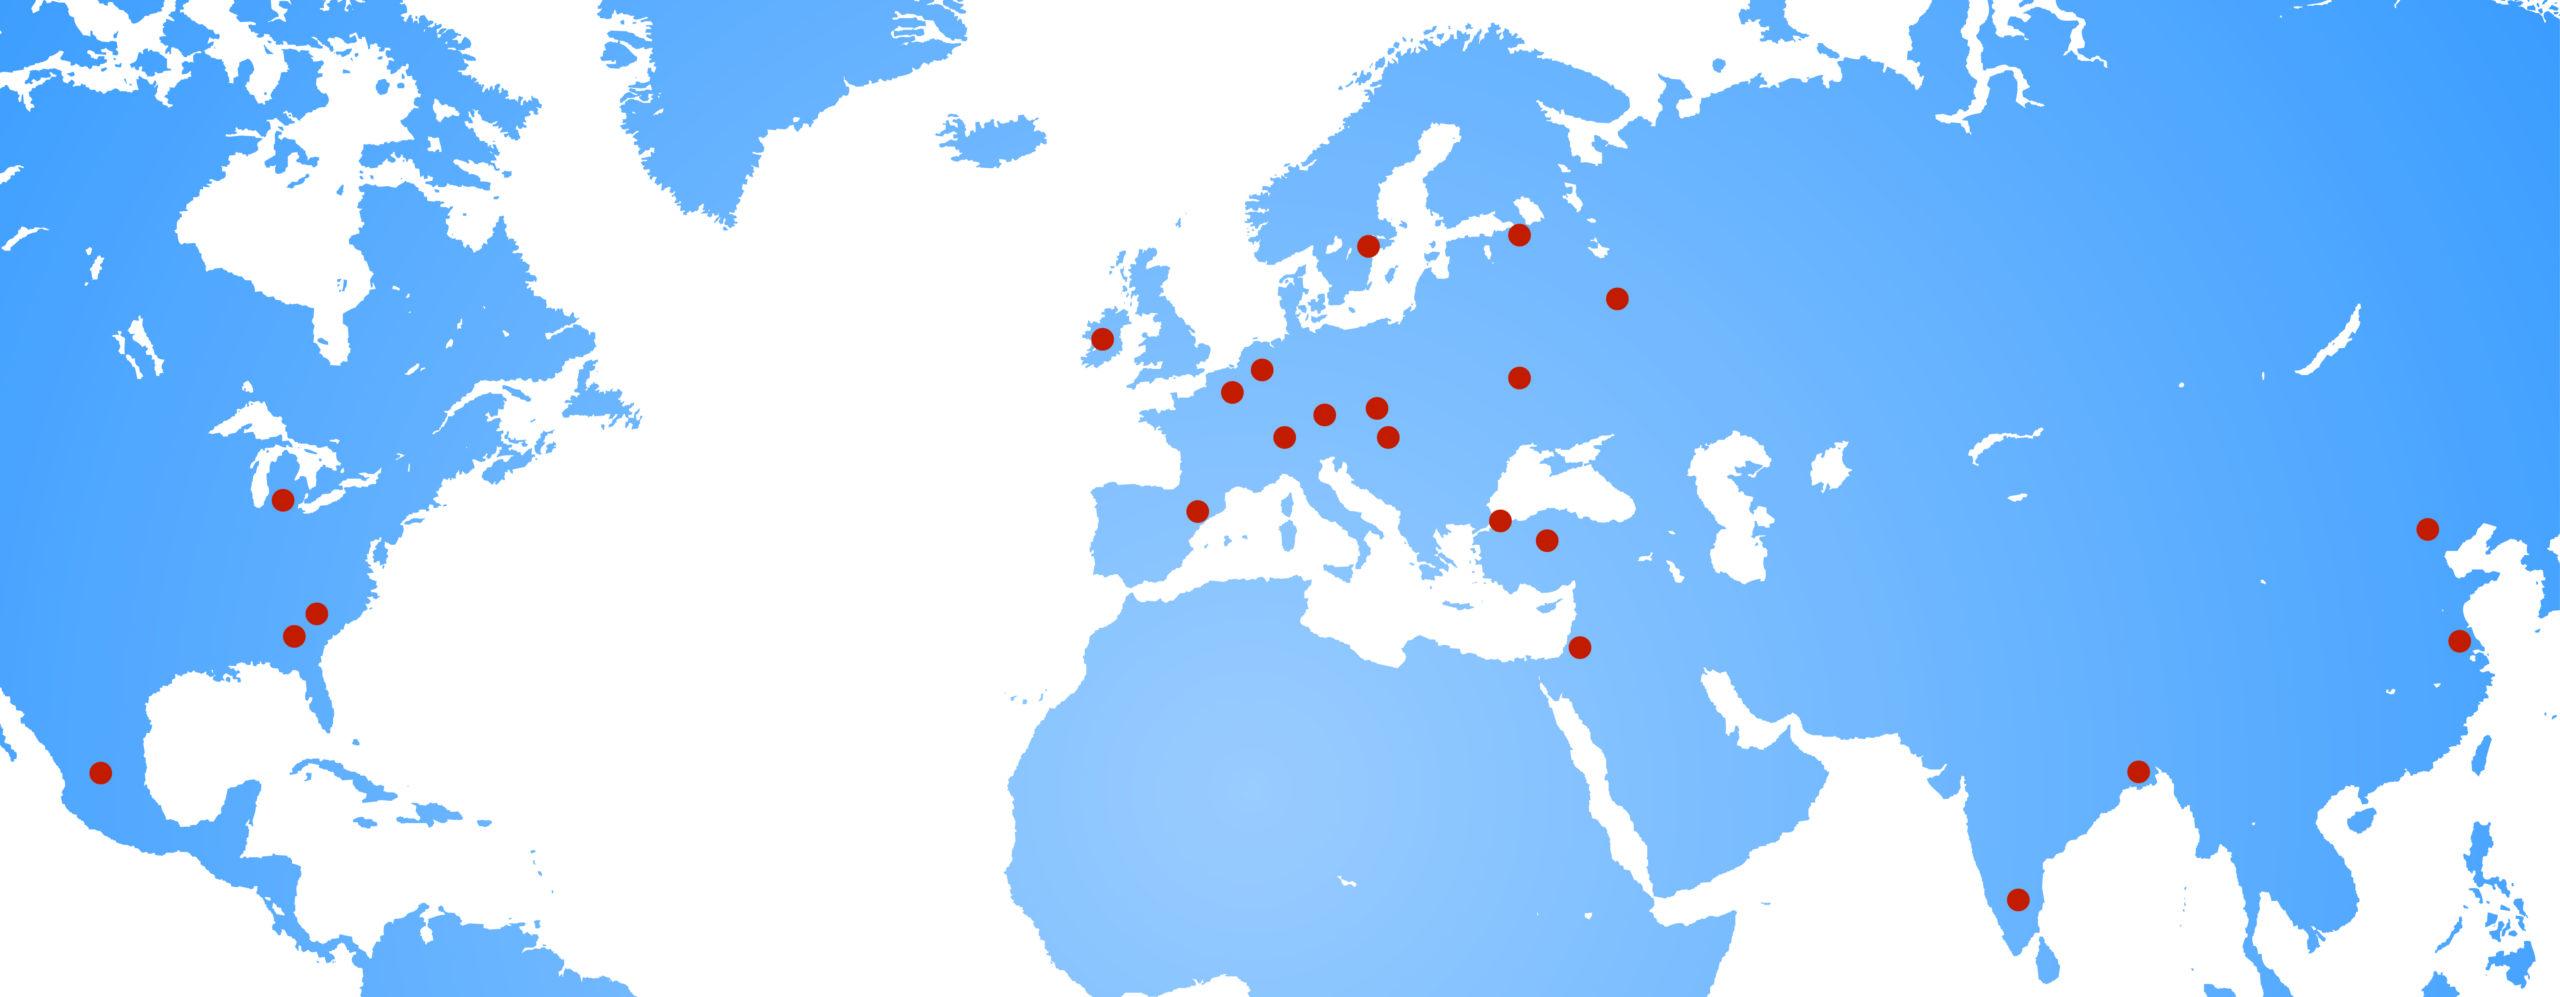 BvL International Network